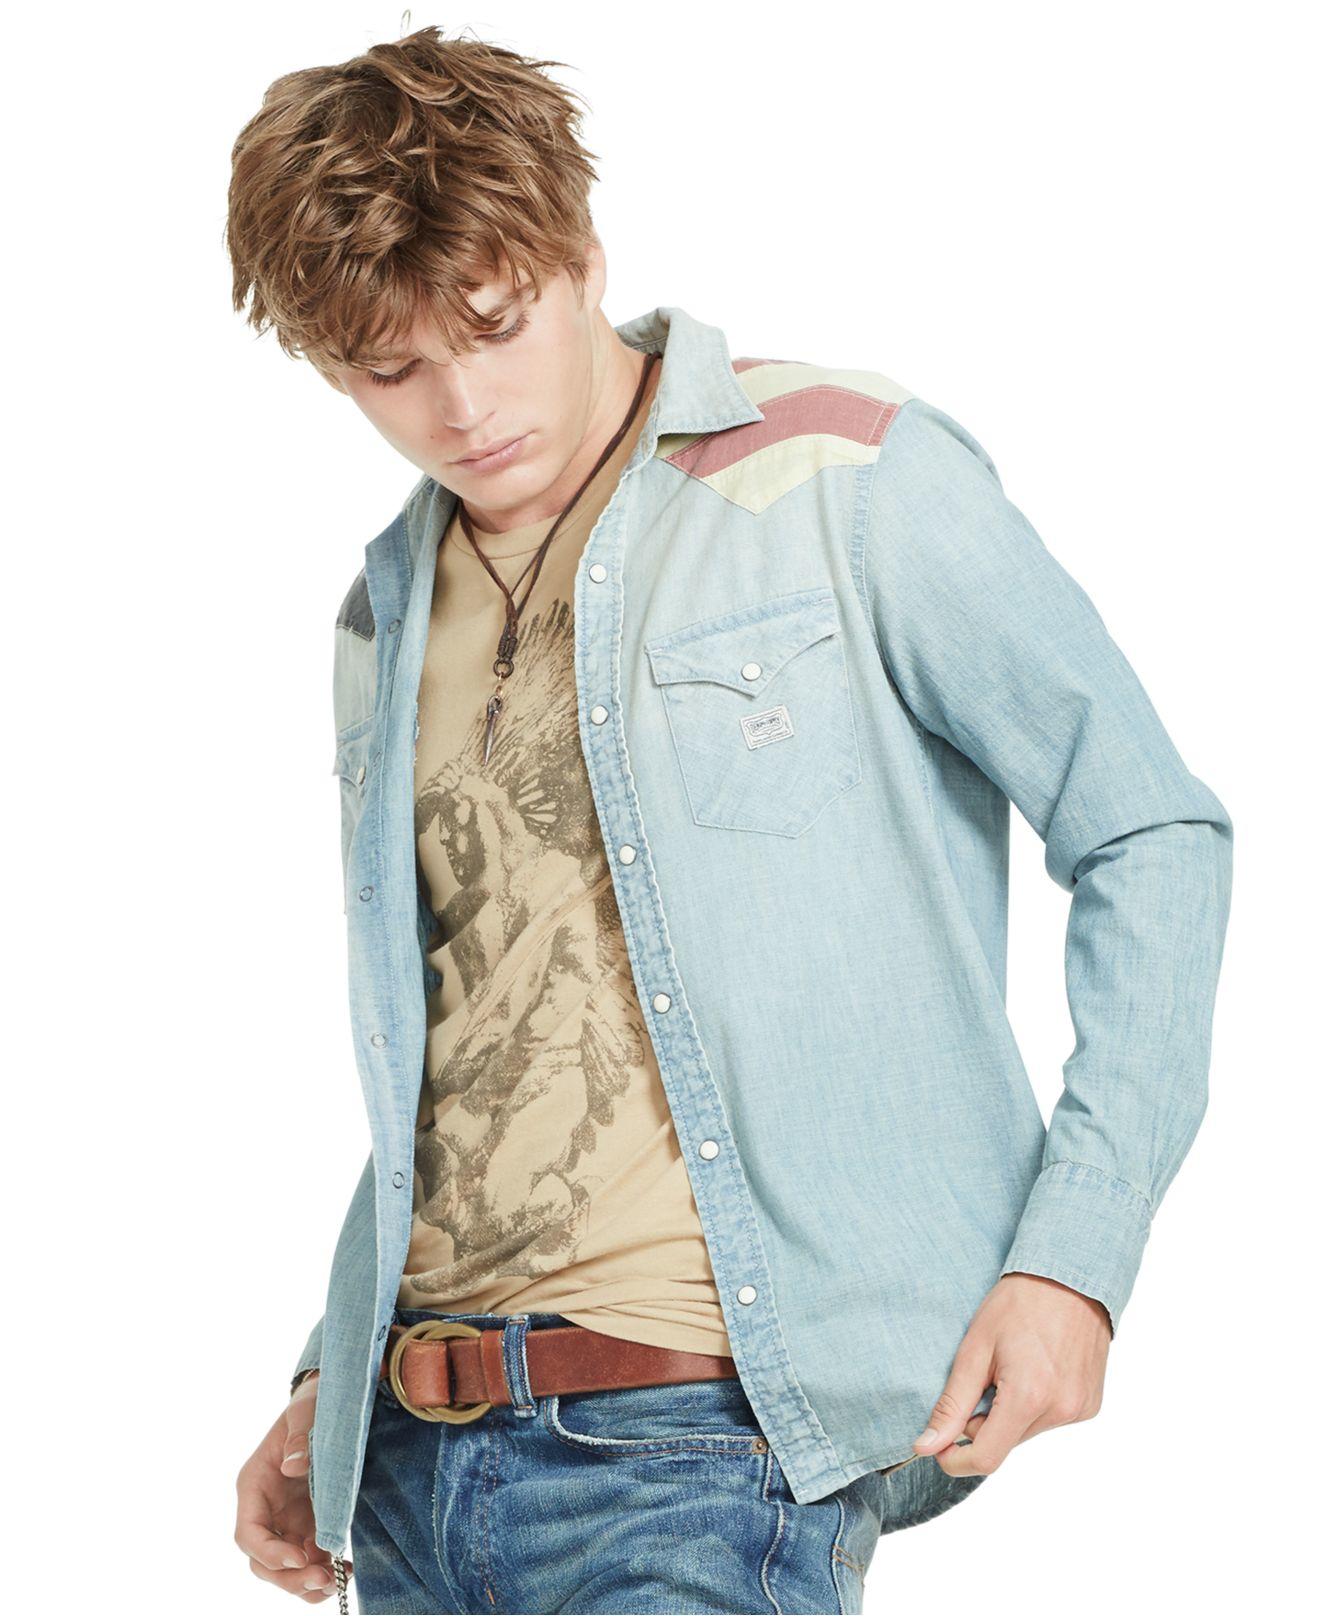 514b2b640d Gallery. Previously sold at  Macy s · Men s Chambray Shirts Men s Ralph  Lauren ...